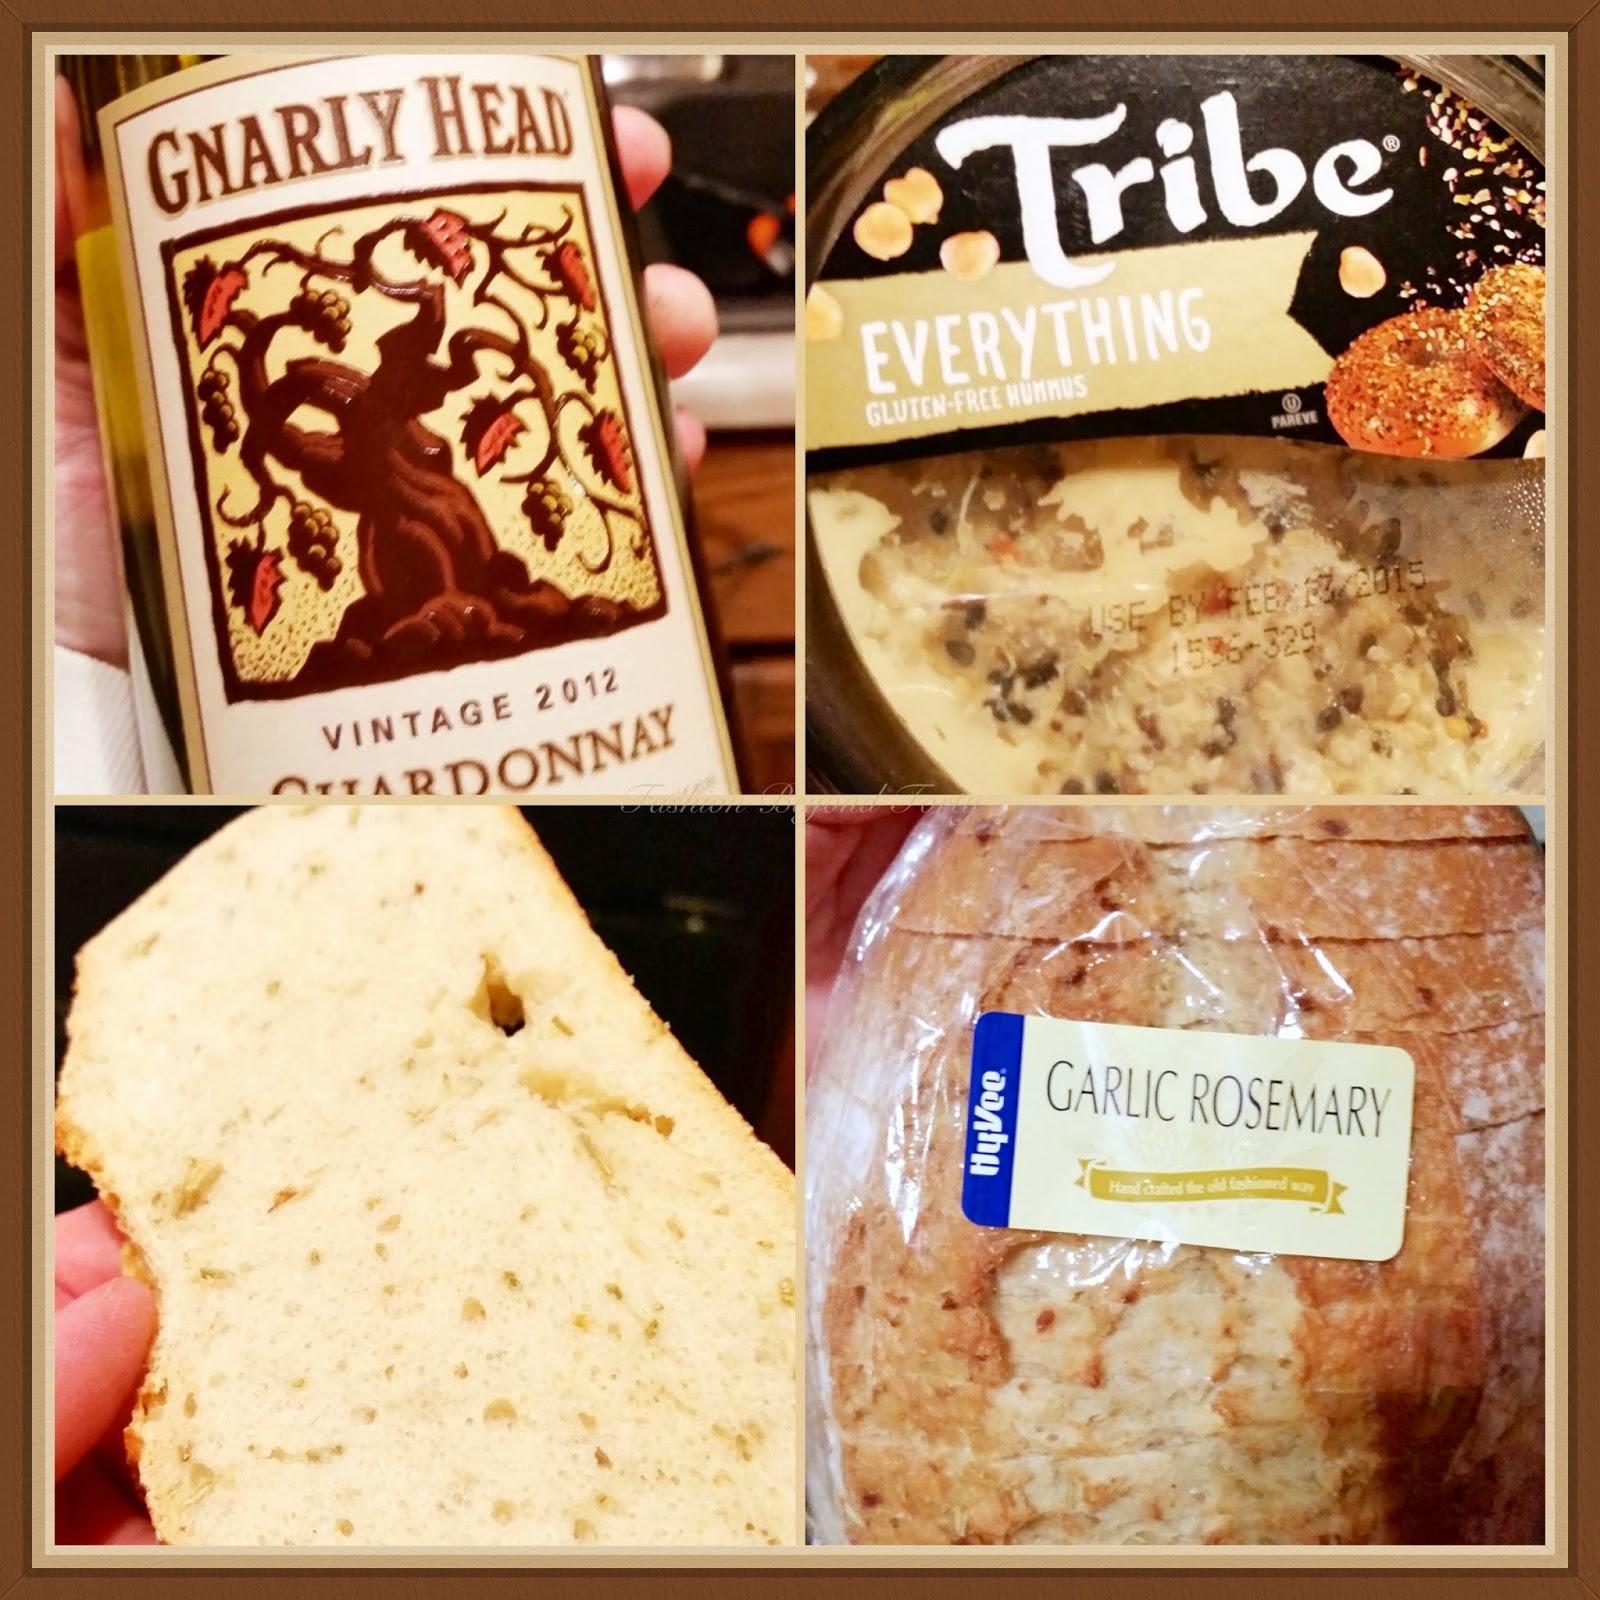 Good Foods Everything Hummus, Gnarly Head Wine, Garlic Rosemary Bread